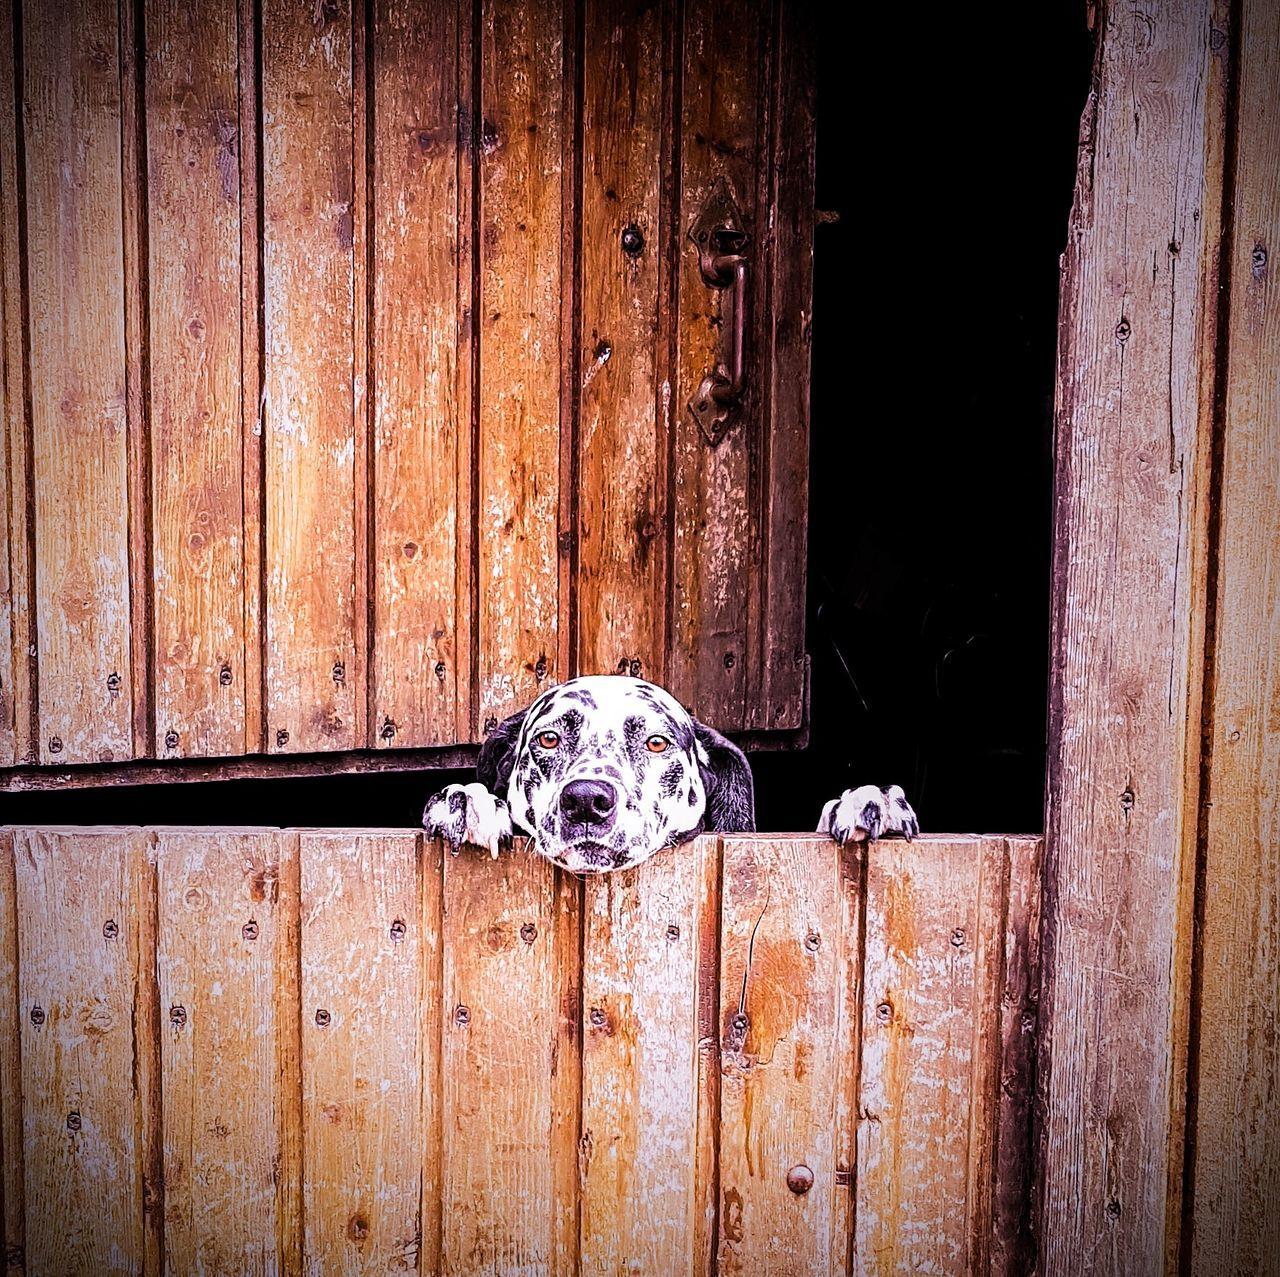 Dalmatiner  Dalmatiansofinstagram Hund Dogs Of EyeEm Dog Love Dogsofinstagram Hundefotografie Hundeportrait Hundeblick EyeEmNewHere